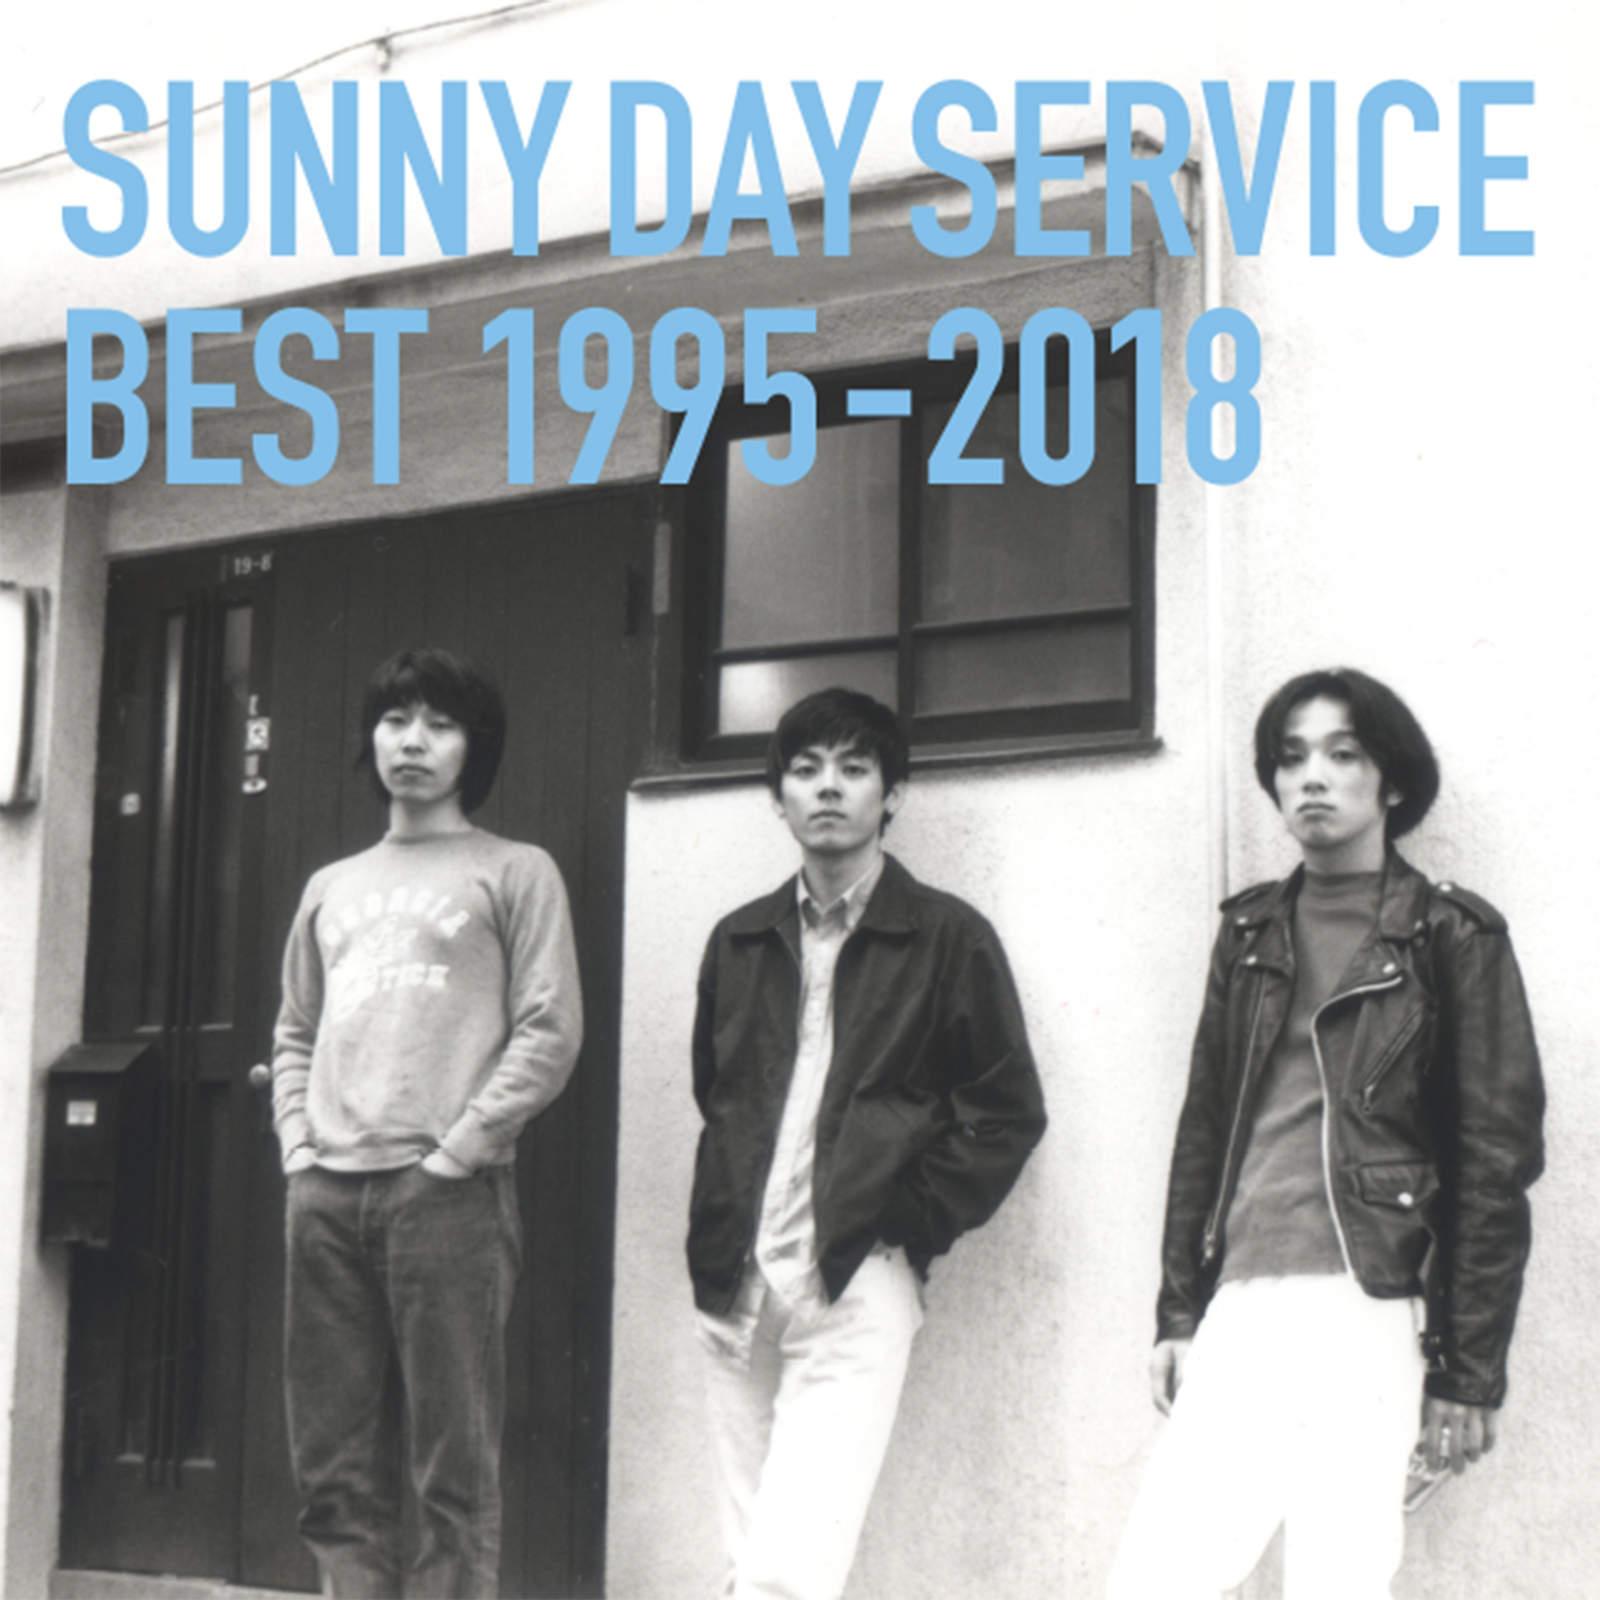 http://rose-records.jp/files/20181120234113.jpg